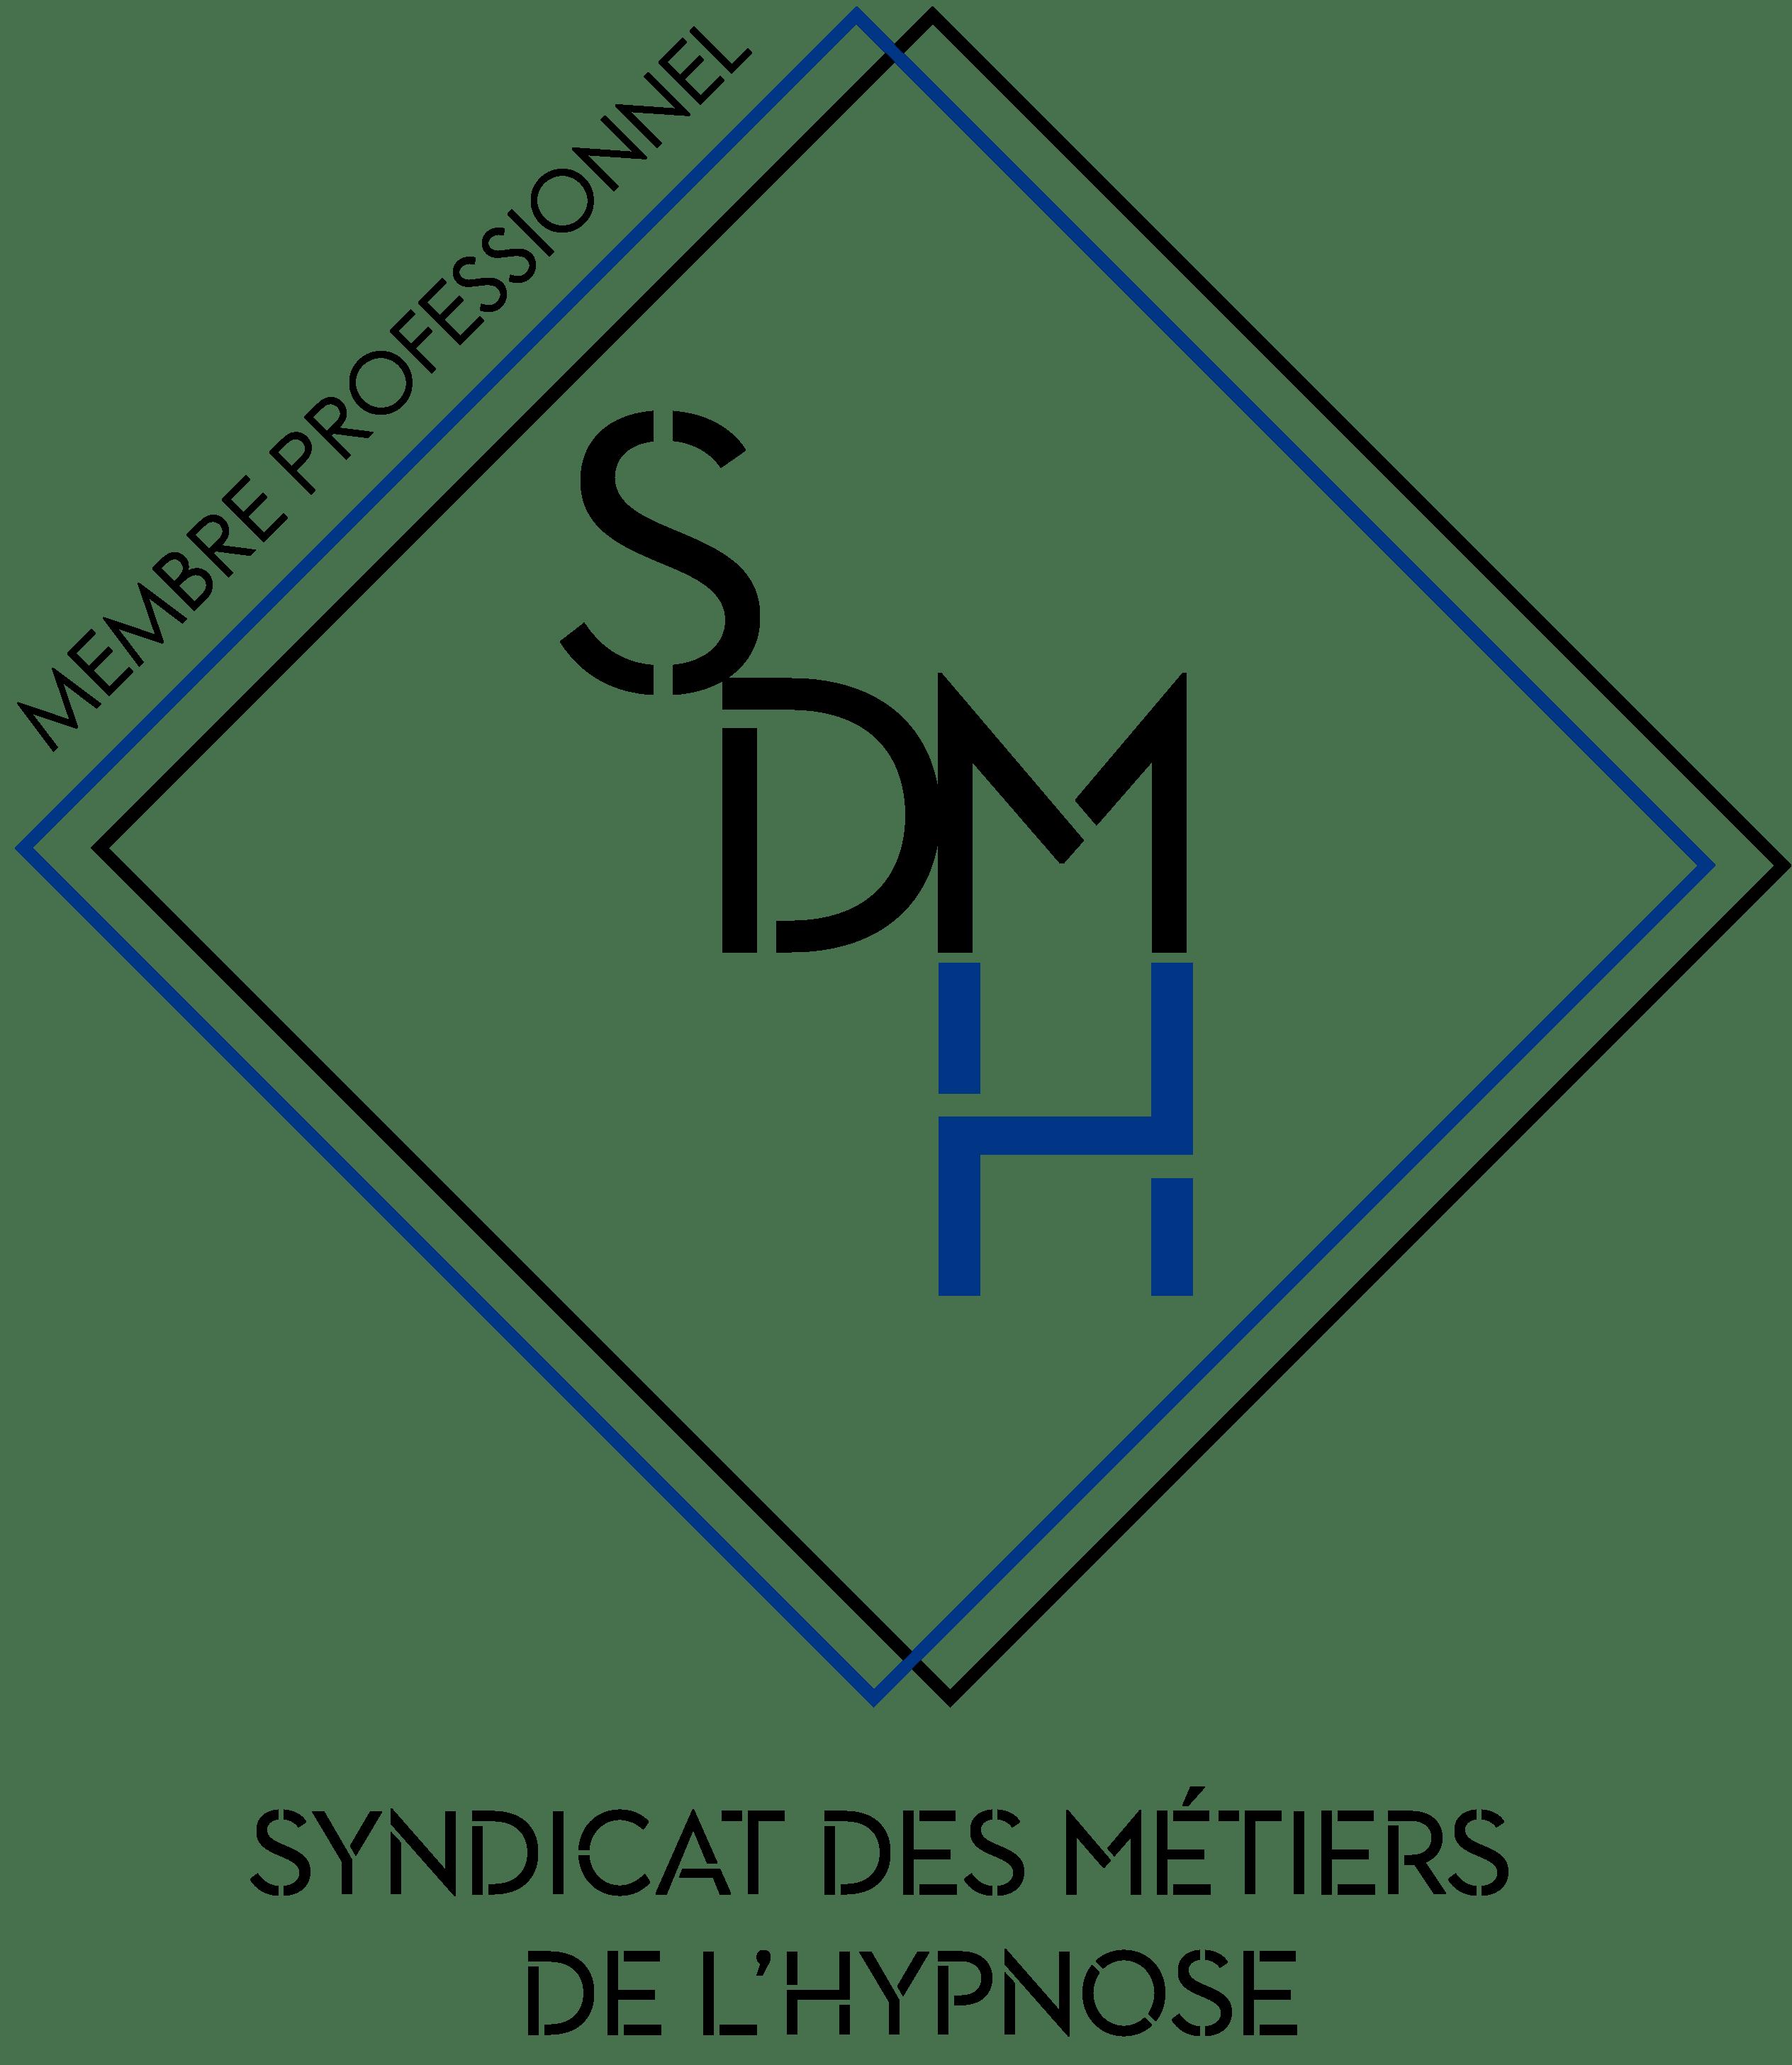 HYPNO'DOUBS - SYNDICAT DES METIERS DE L'HYPNOSE